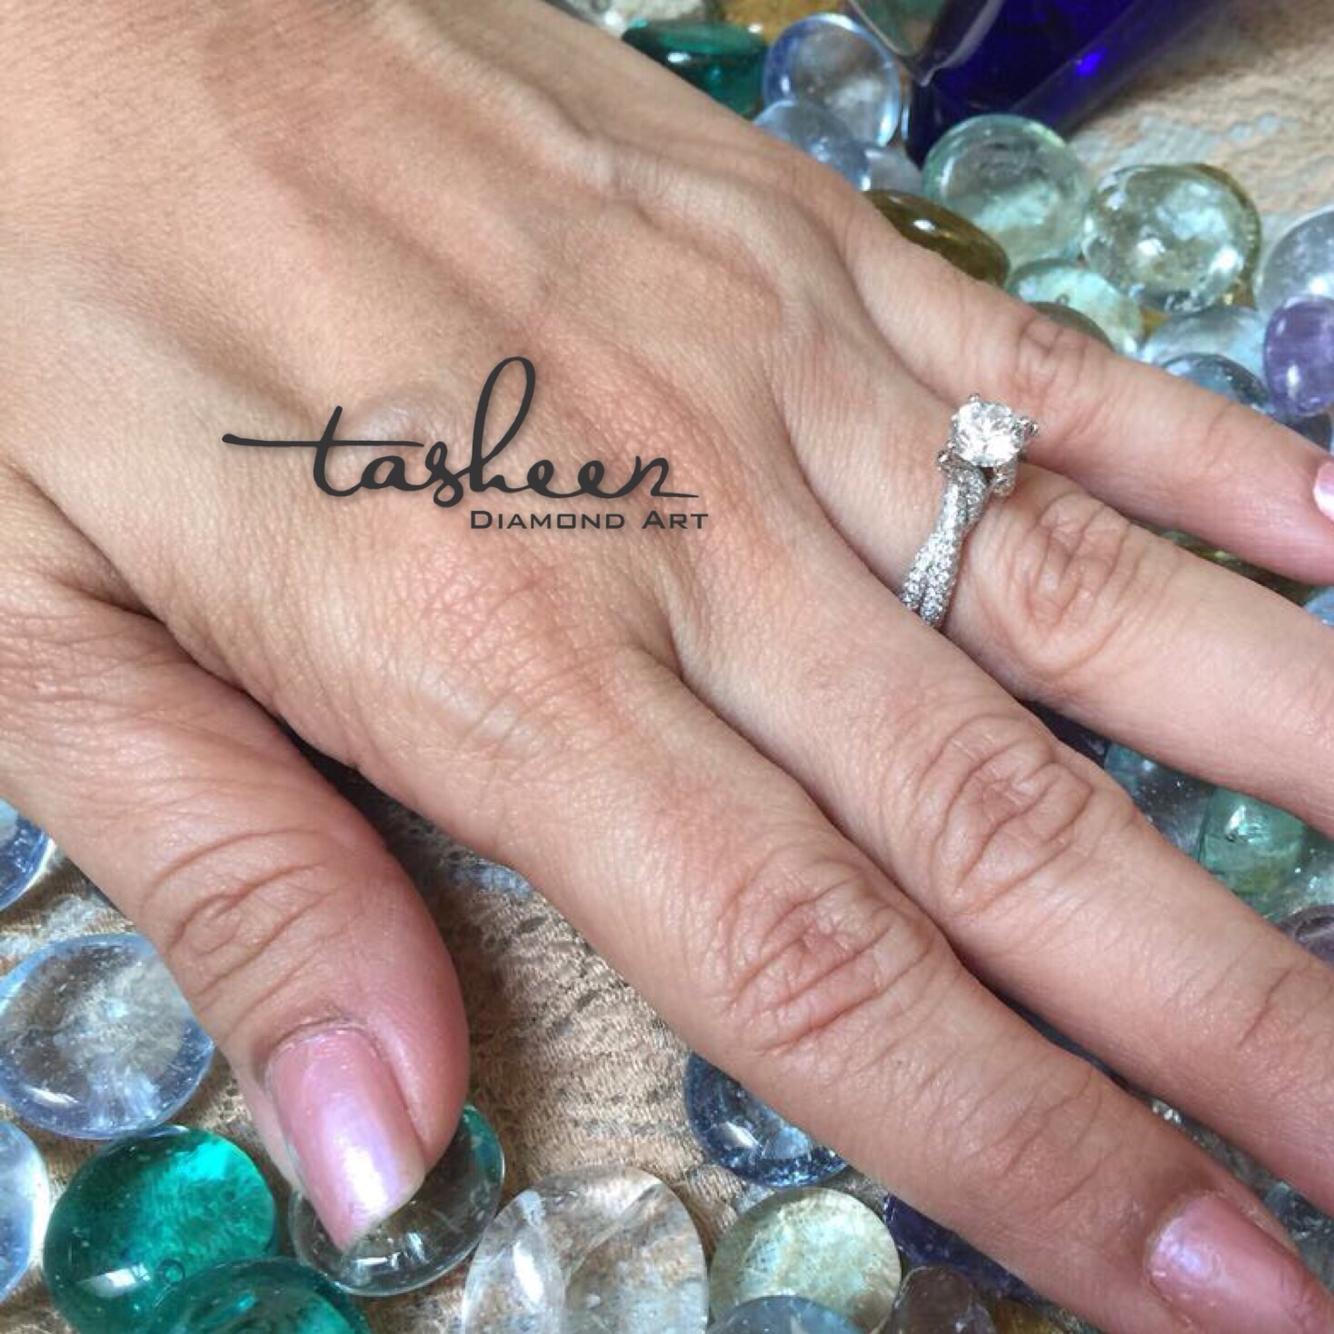 Tasheen Diamond Art   Wedding Jewelry in Jakarta   Bridestory.com